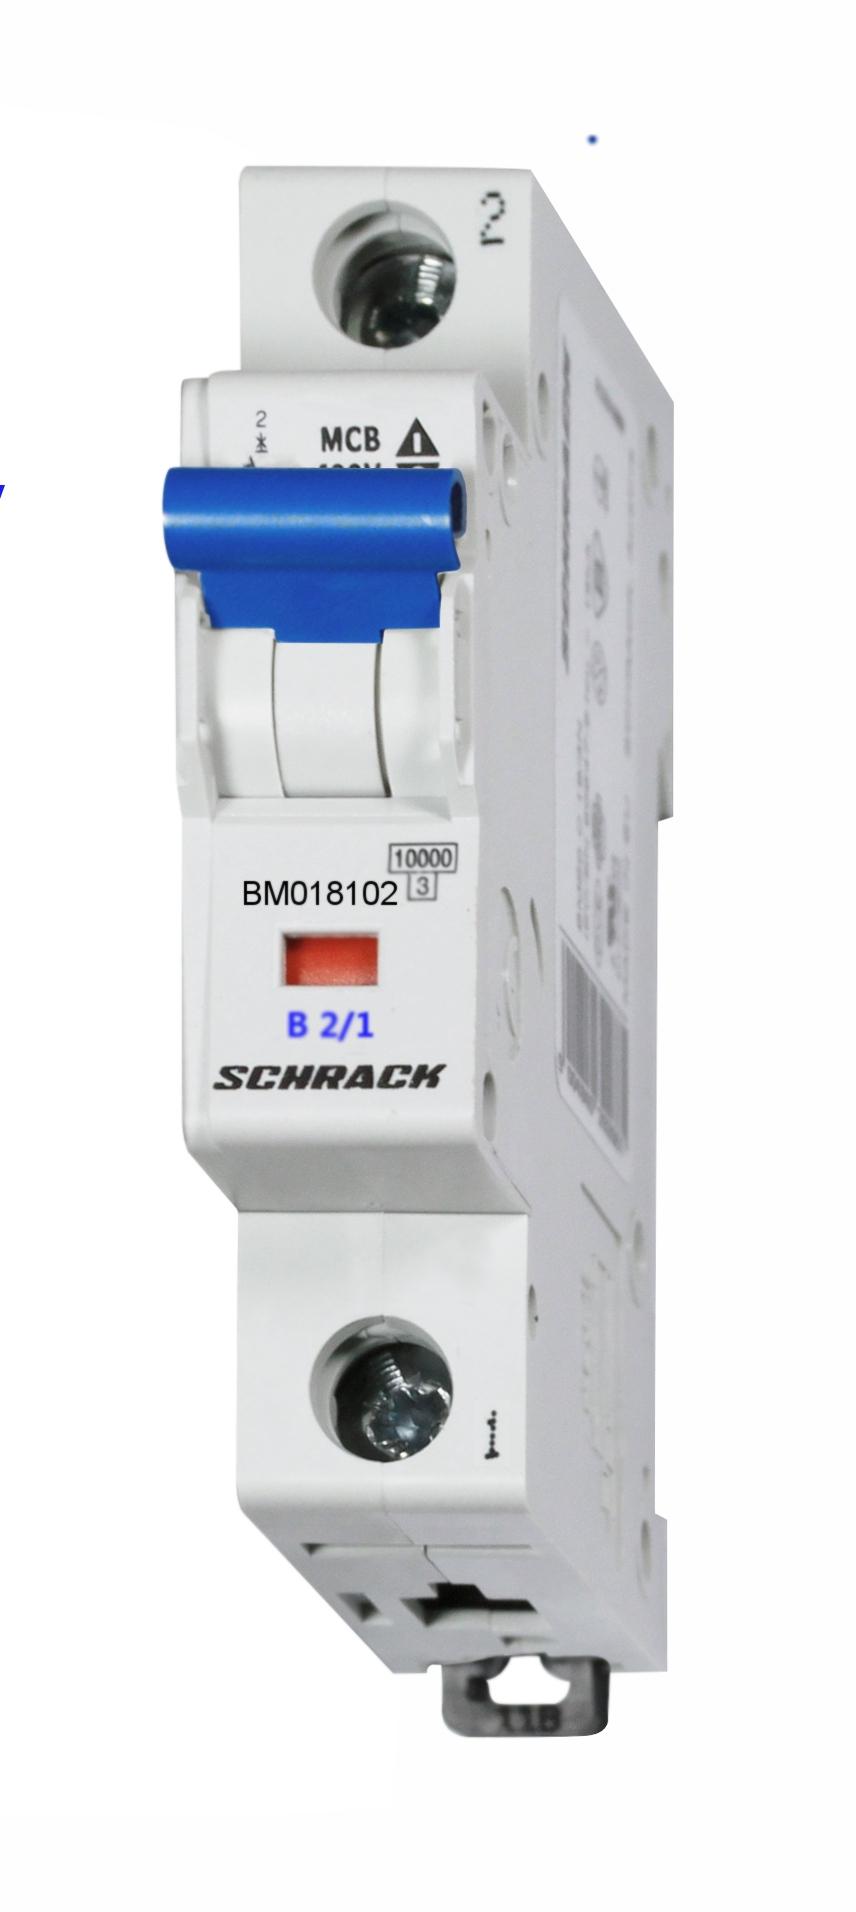 BM018102 - Schrack Technik